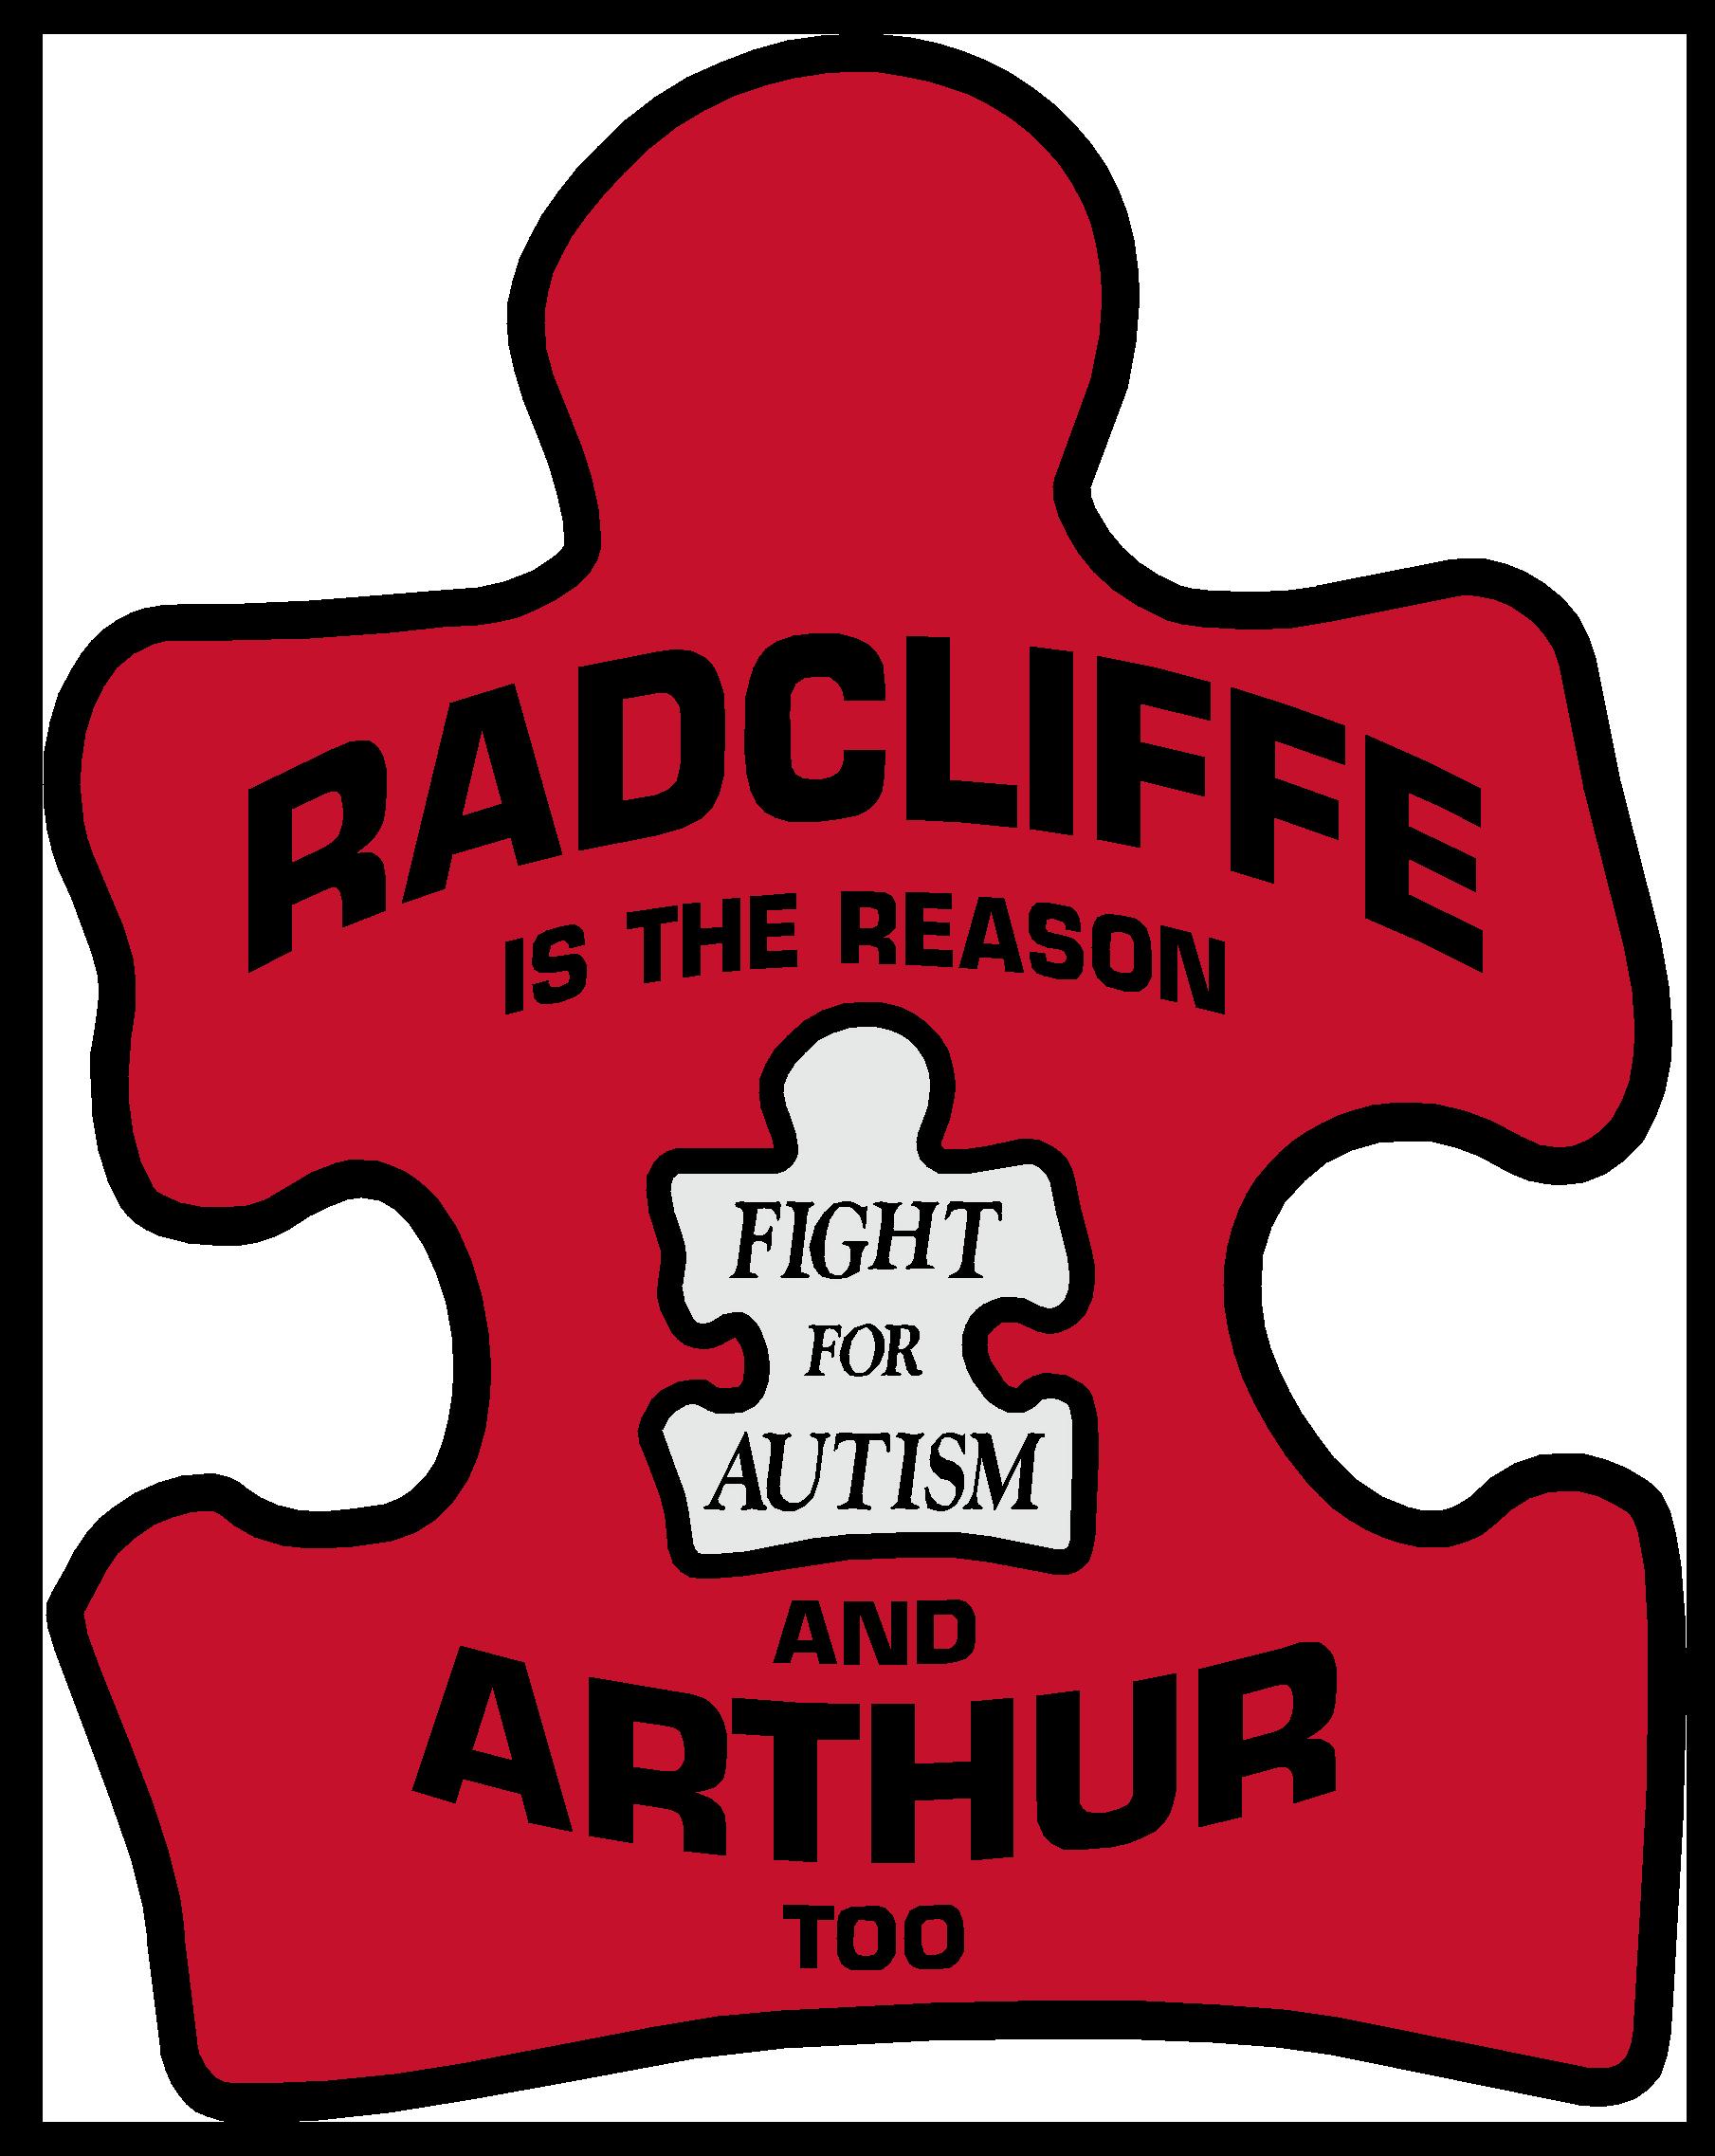 Radcliffe new logo 2013 no background